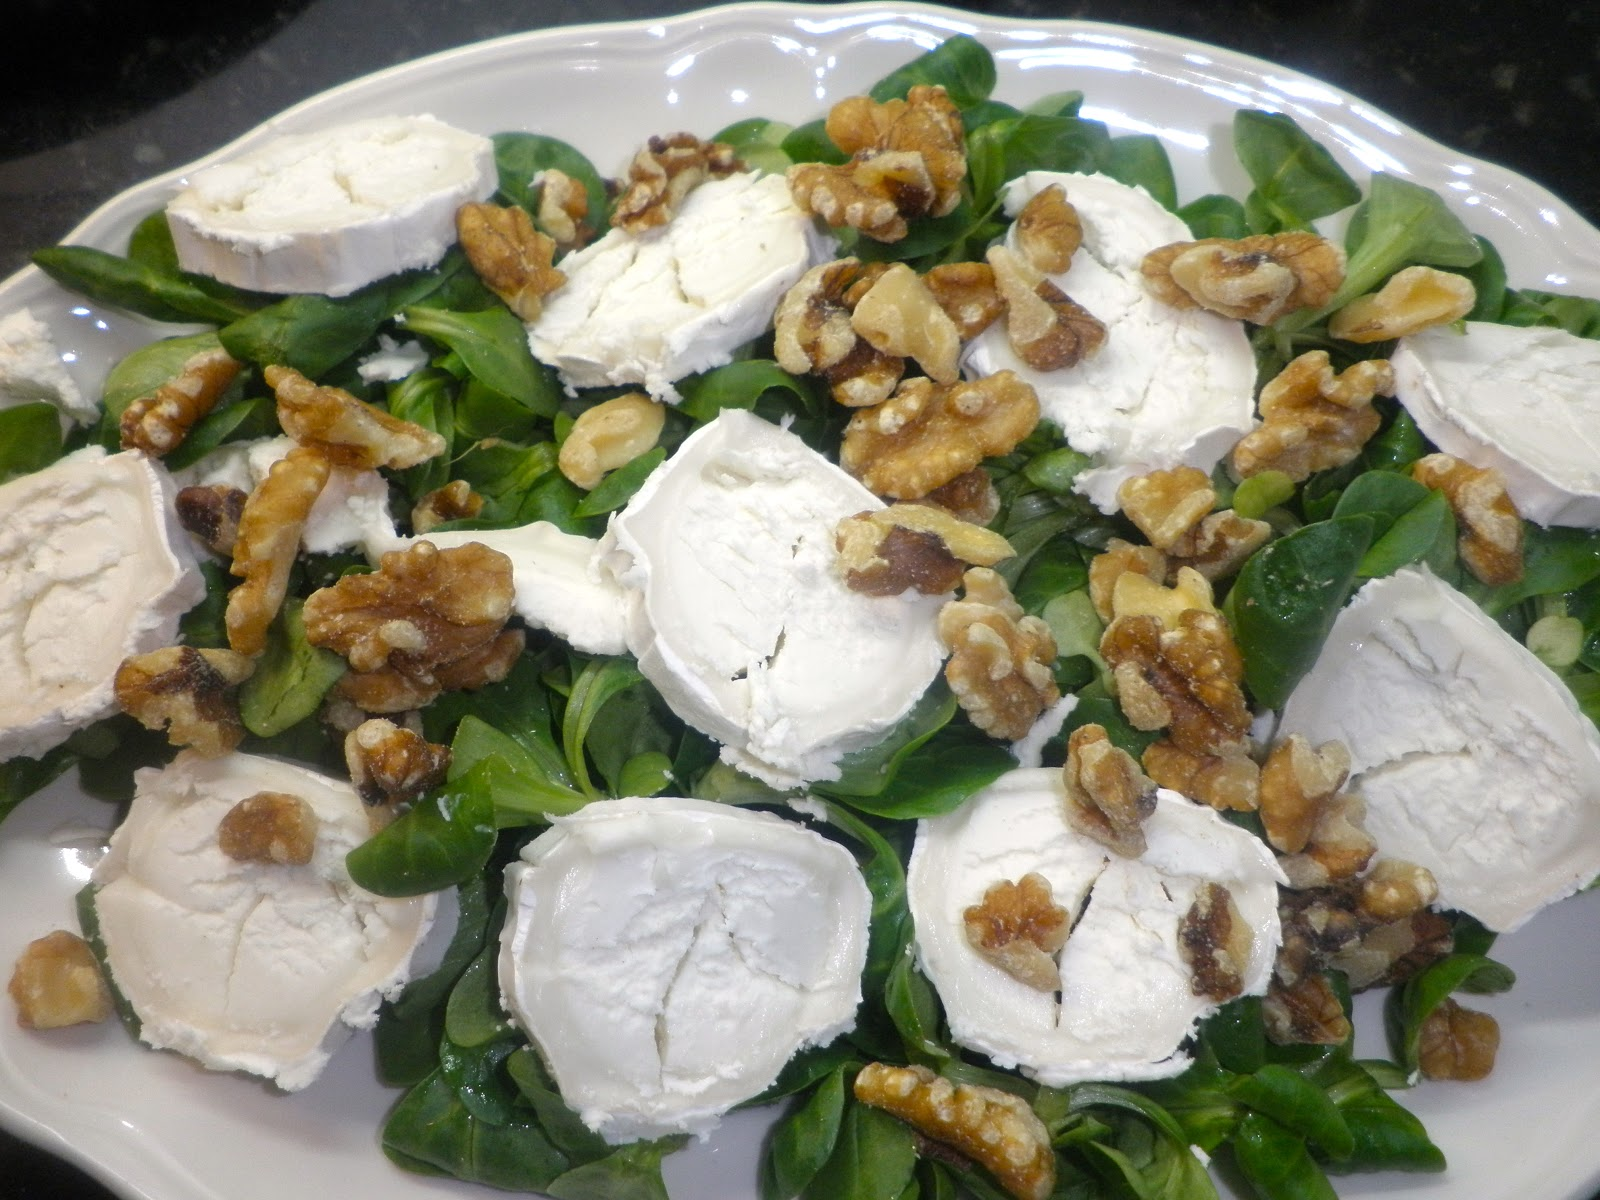 Recetas de cocina paso a paso de inma martos ensalada de - Ensaladas con canonigos ...